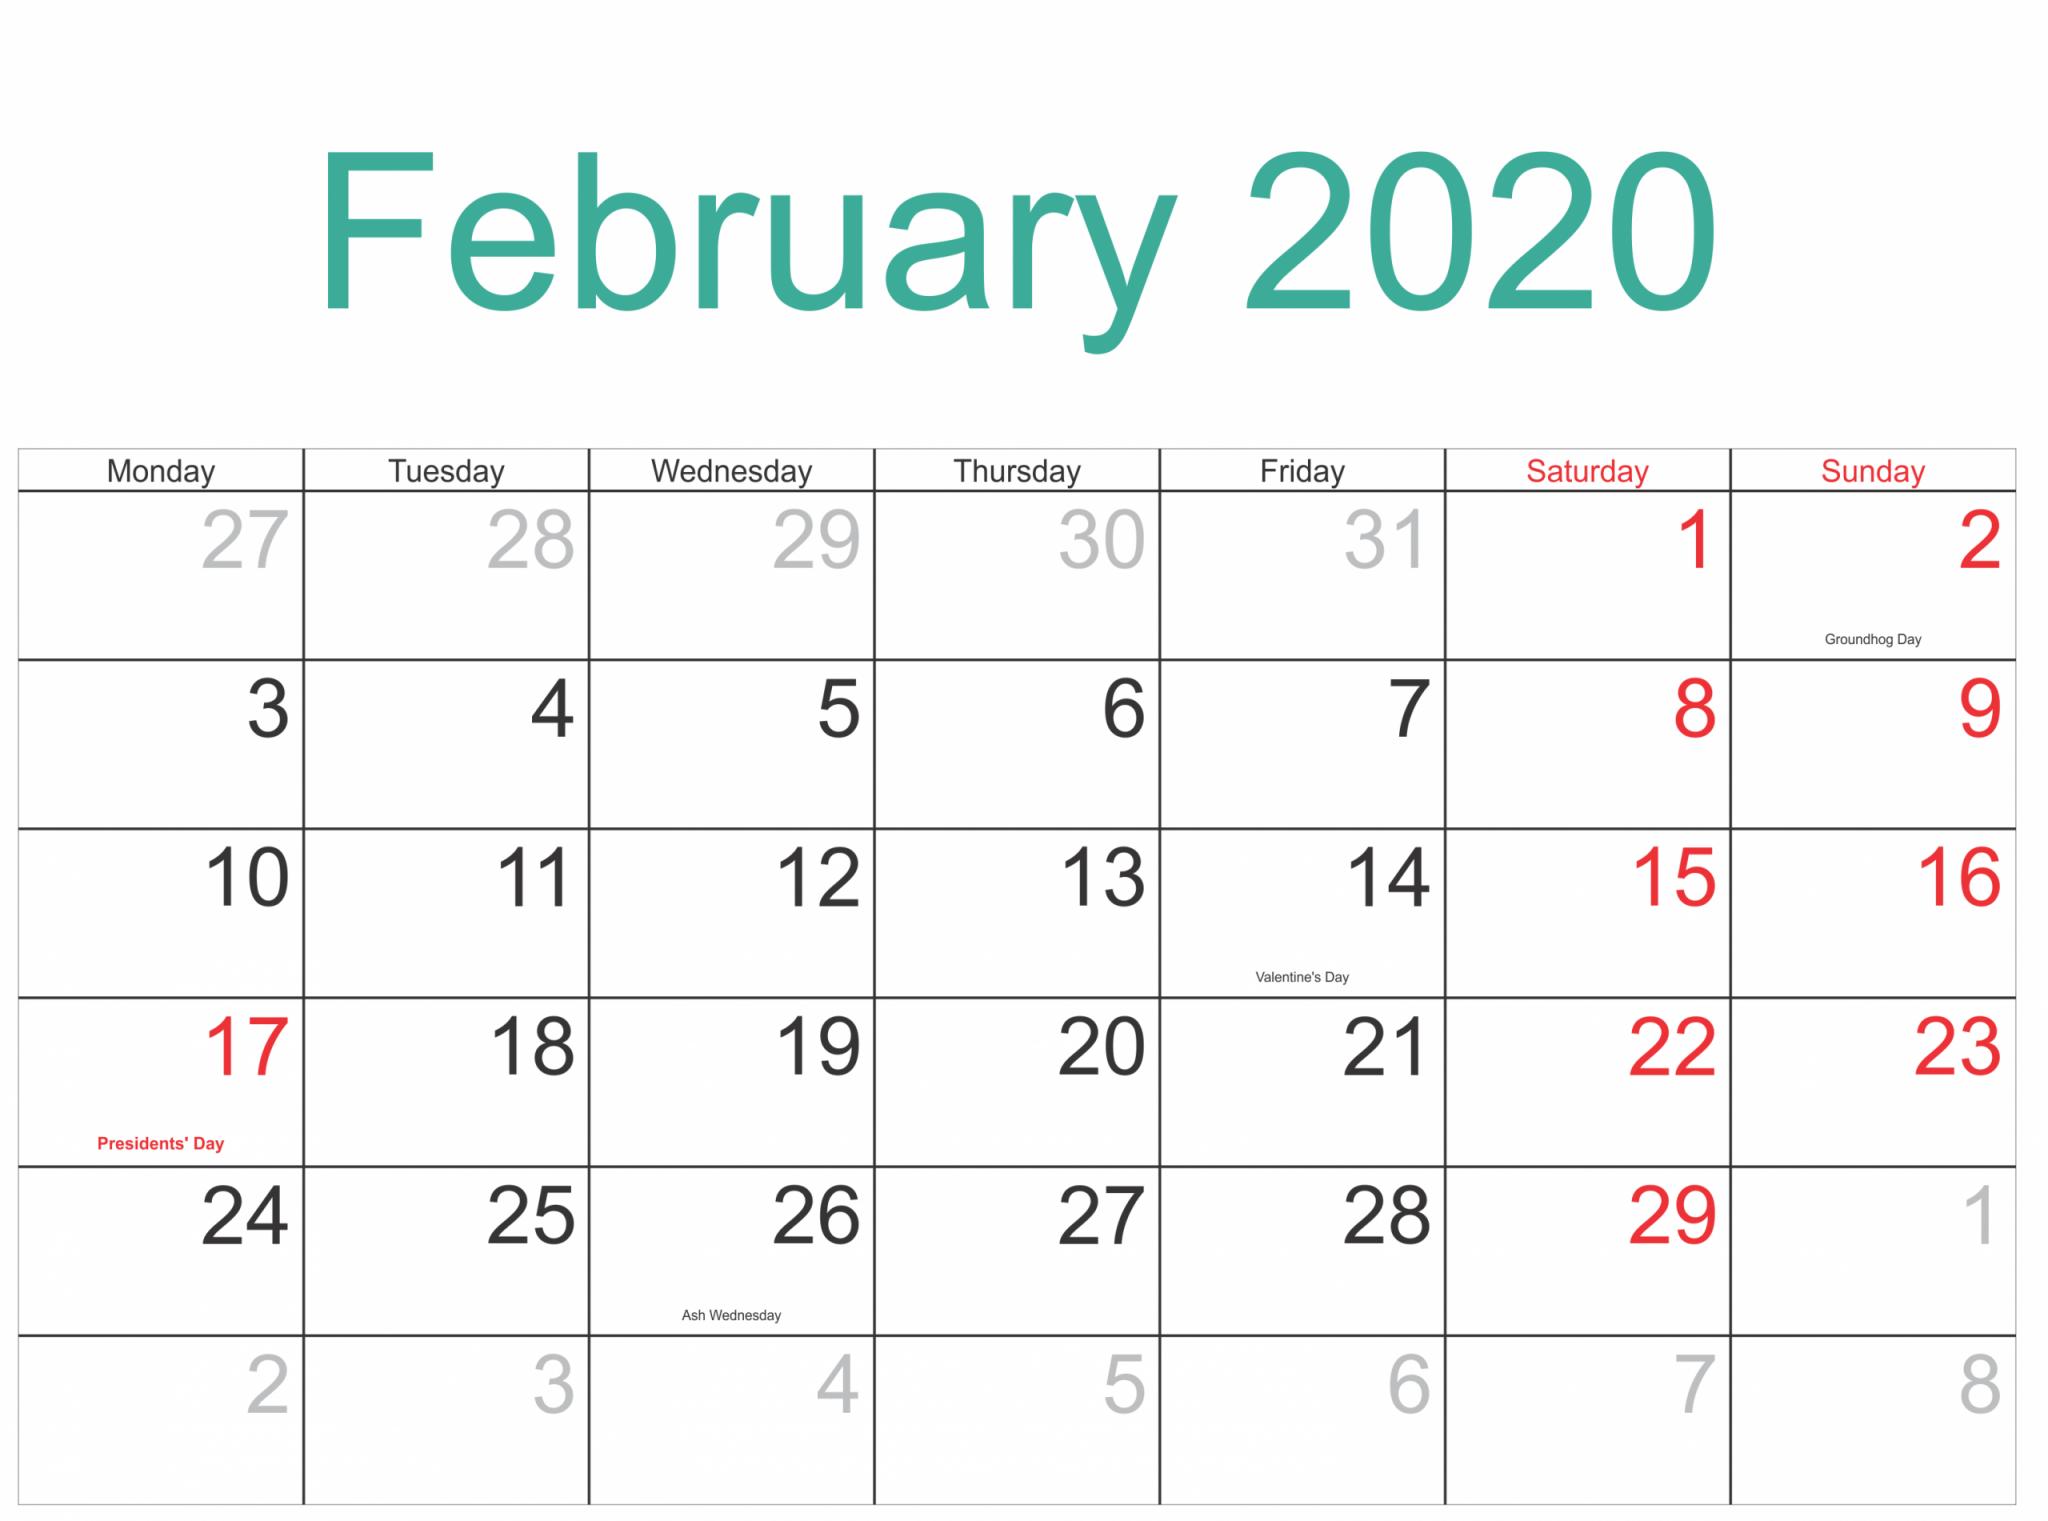 February 2020 US Holidays Template